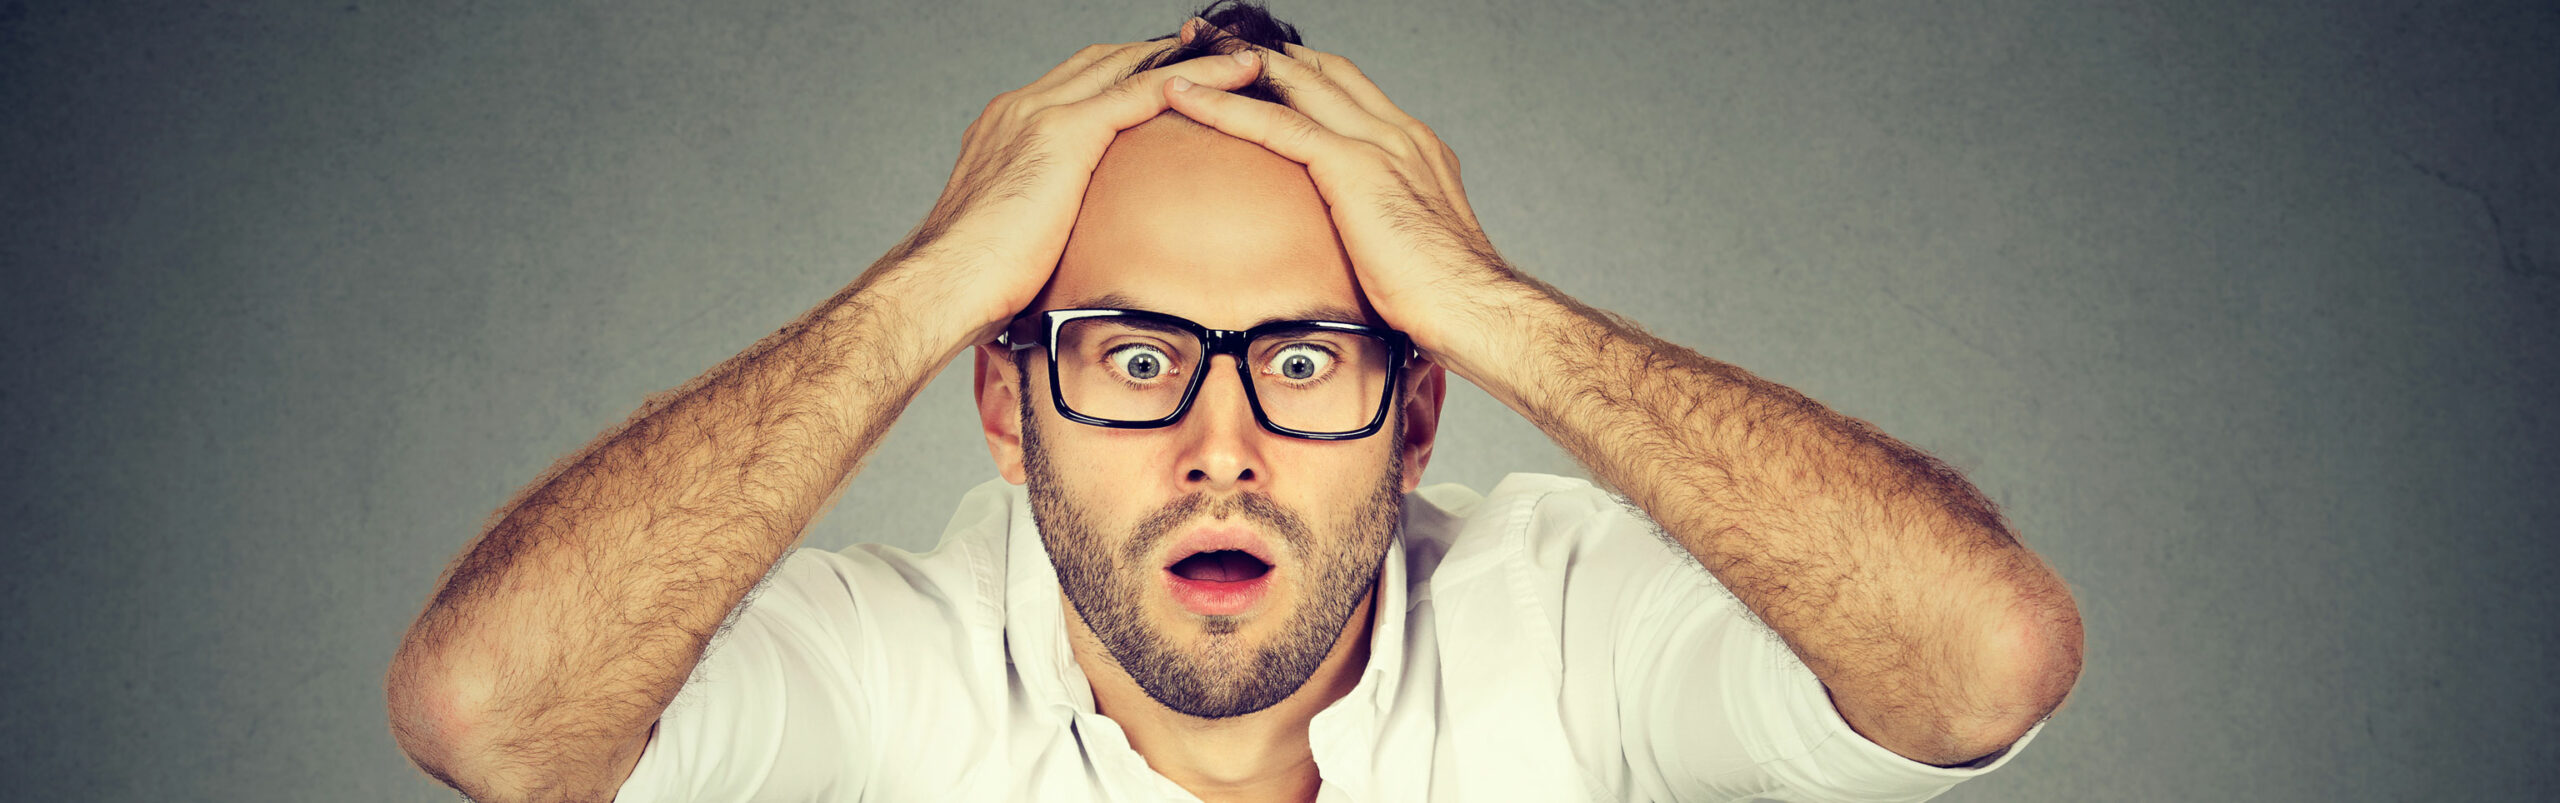 5 curiosidades de la caída capilar